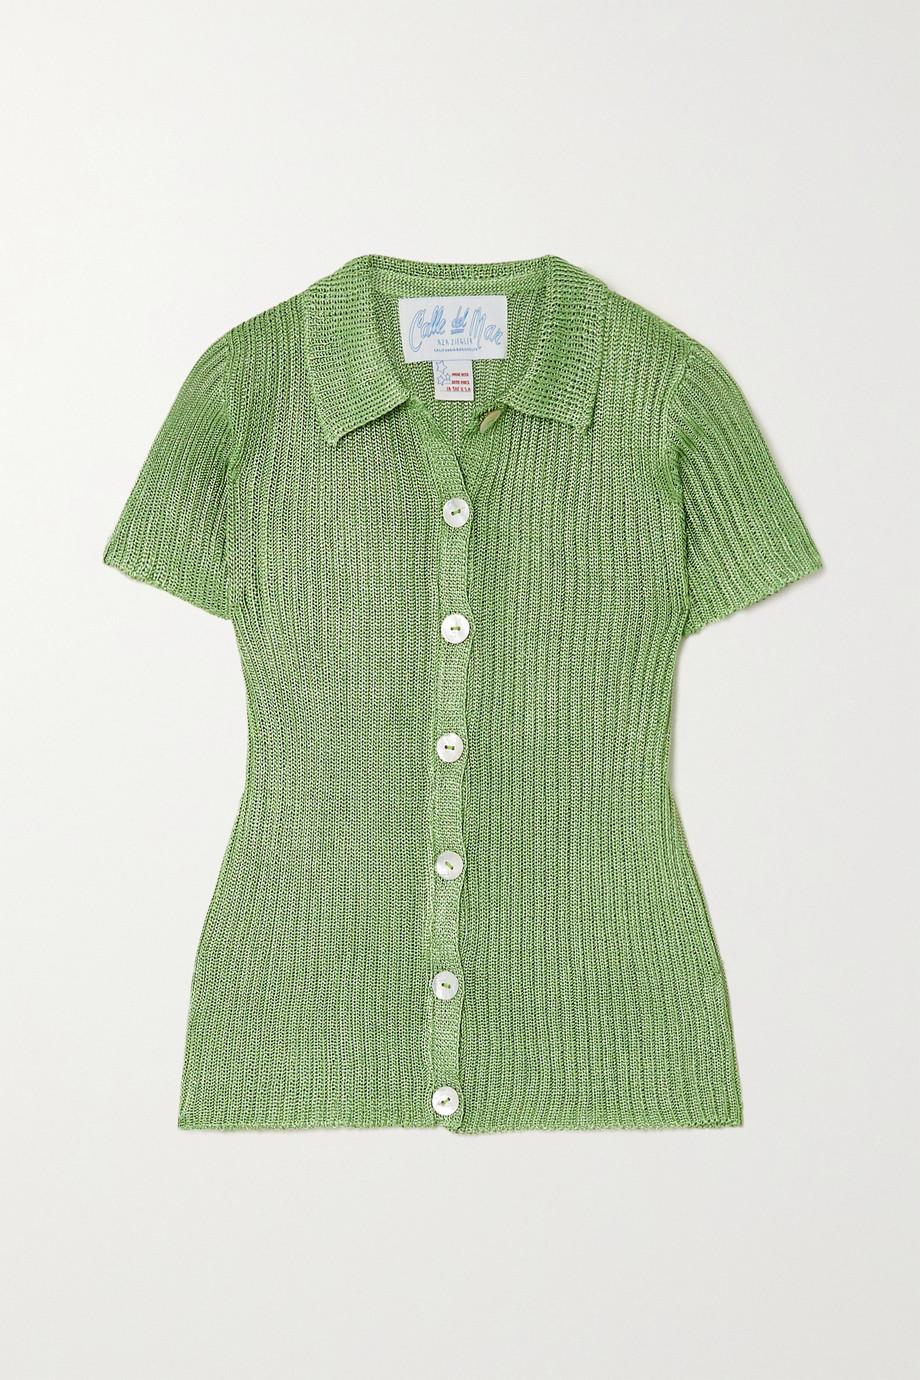 Calle Del Mar Ribbed-knit shirt